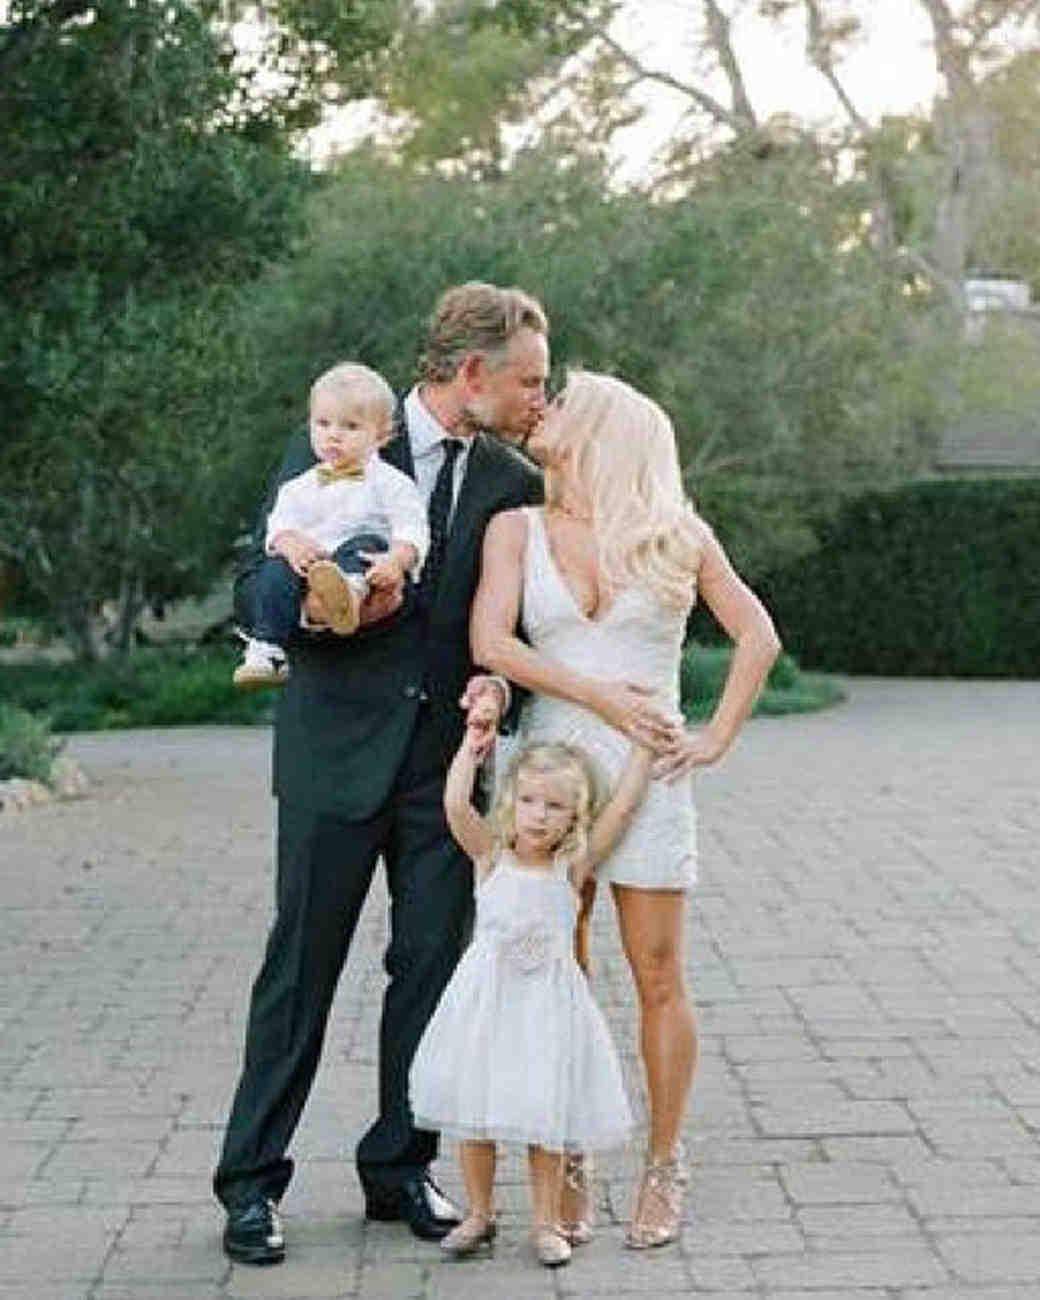 maxwell-ace-eric-johnson-jessica-simpson-celebrity-kids-weddings-0716.jpg